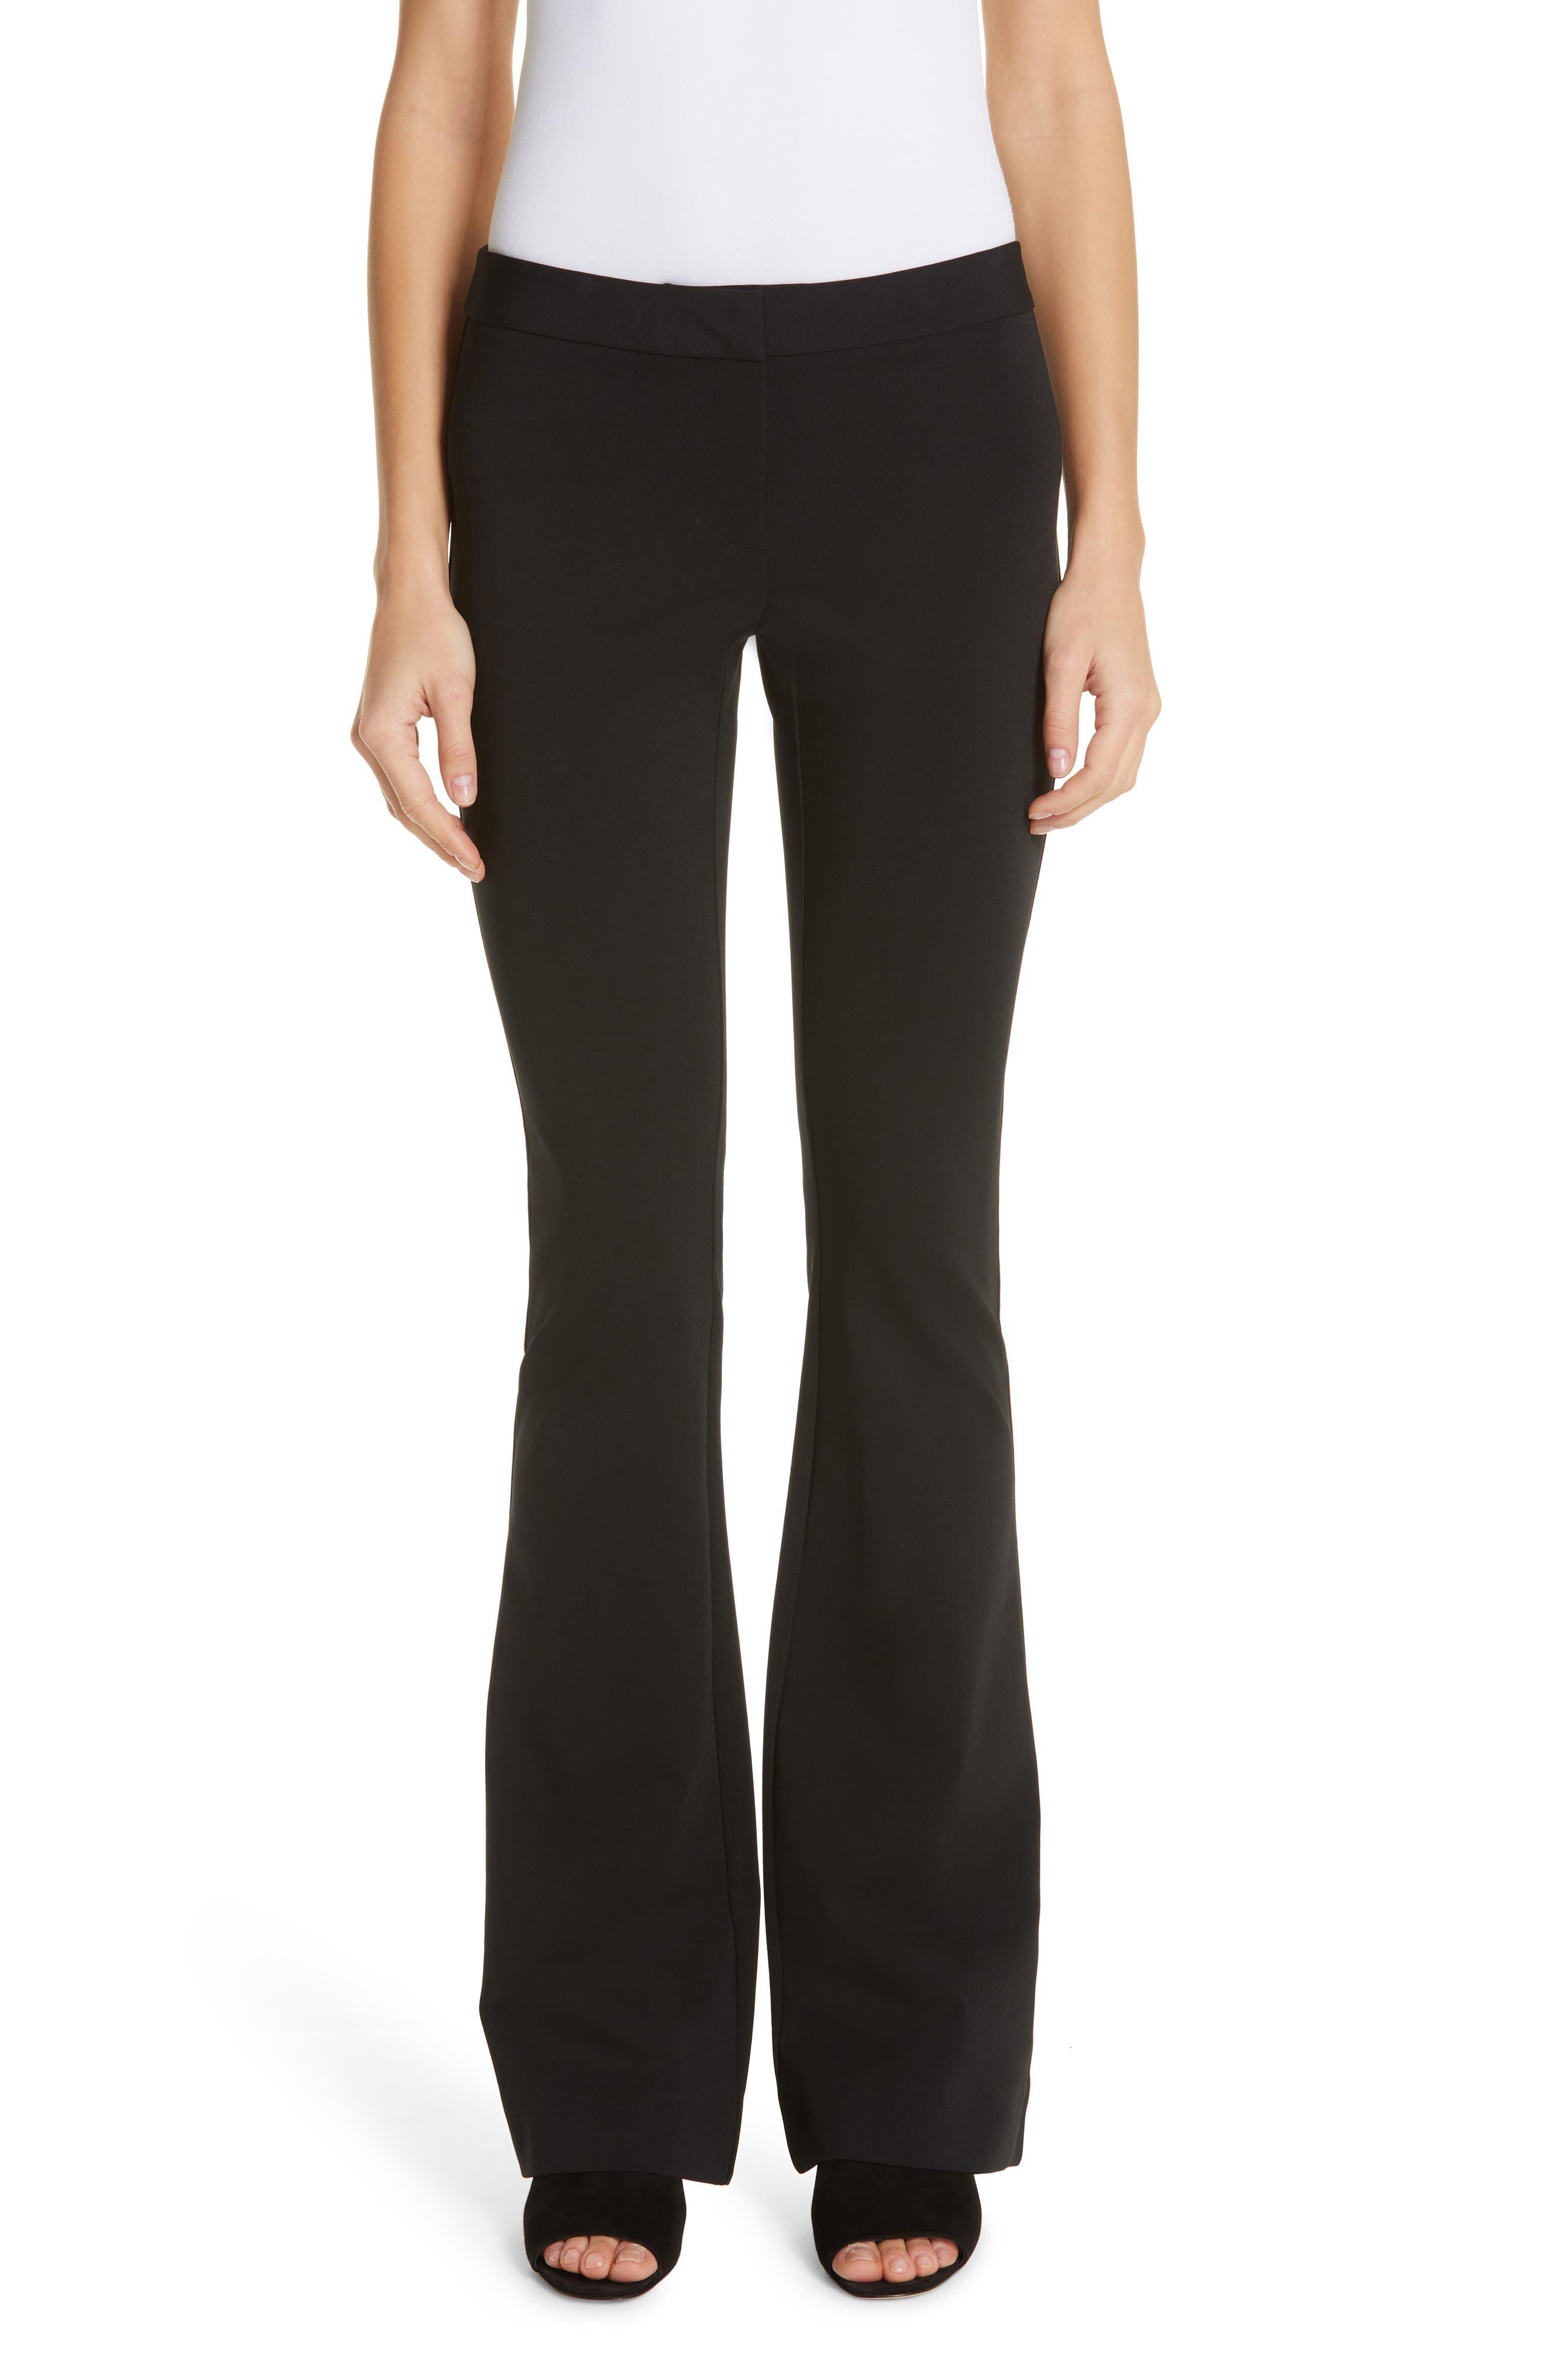 Lafayette 148 New York Waldorf Flare Pants, Black